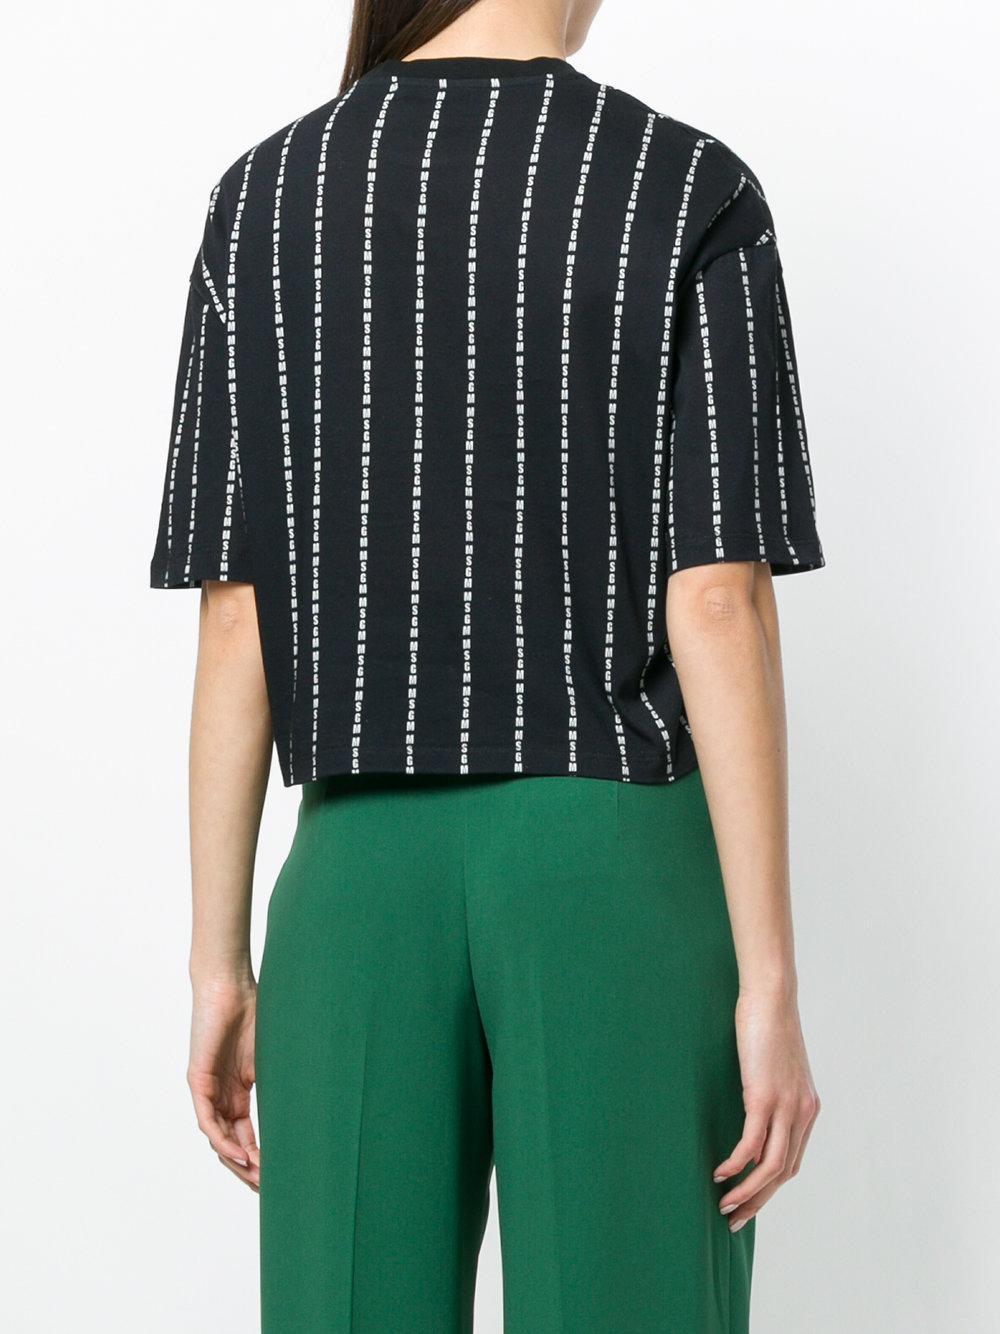 5224bef5a9f81 msgm-Black-Brand-Stripe-Cropped-T-shirt.jpeg